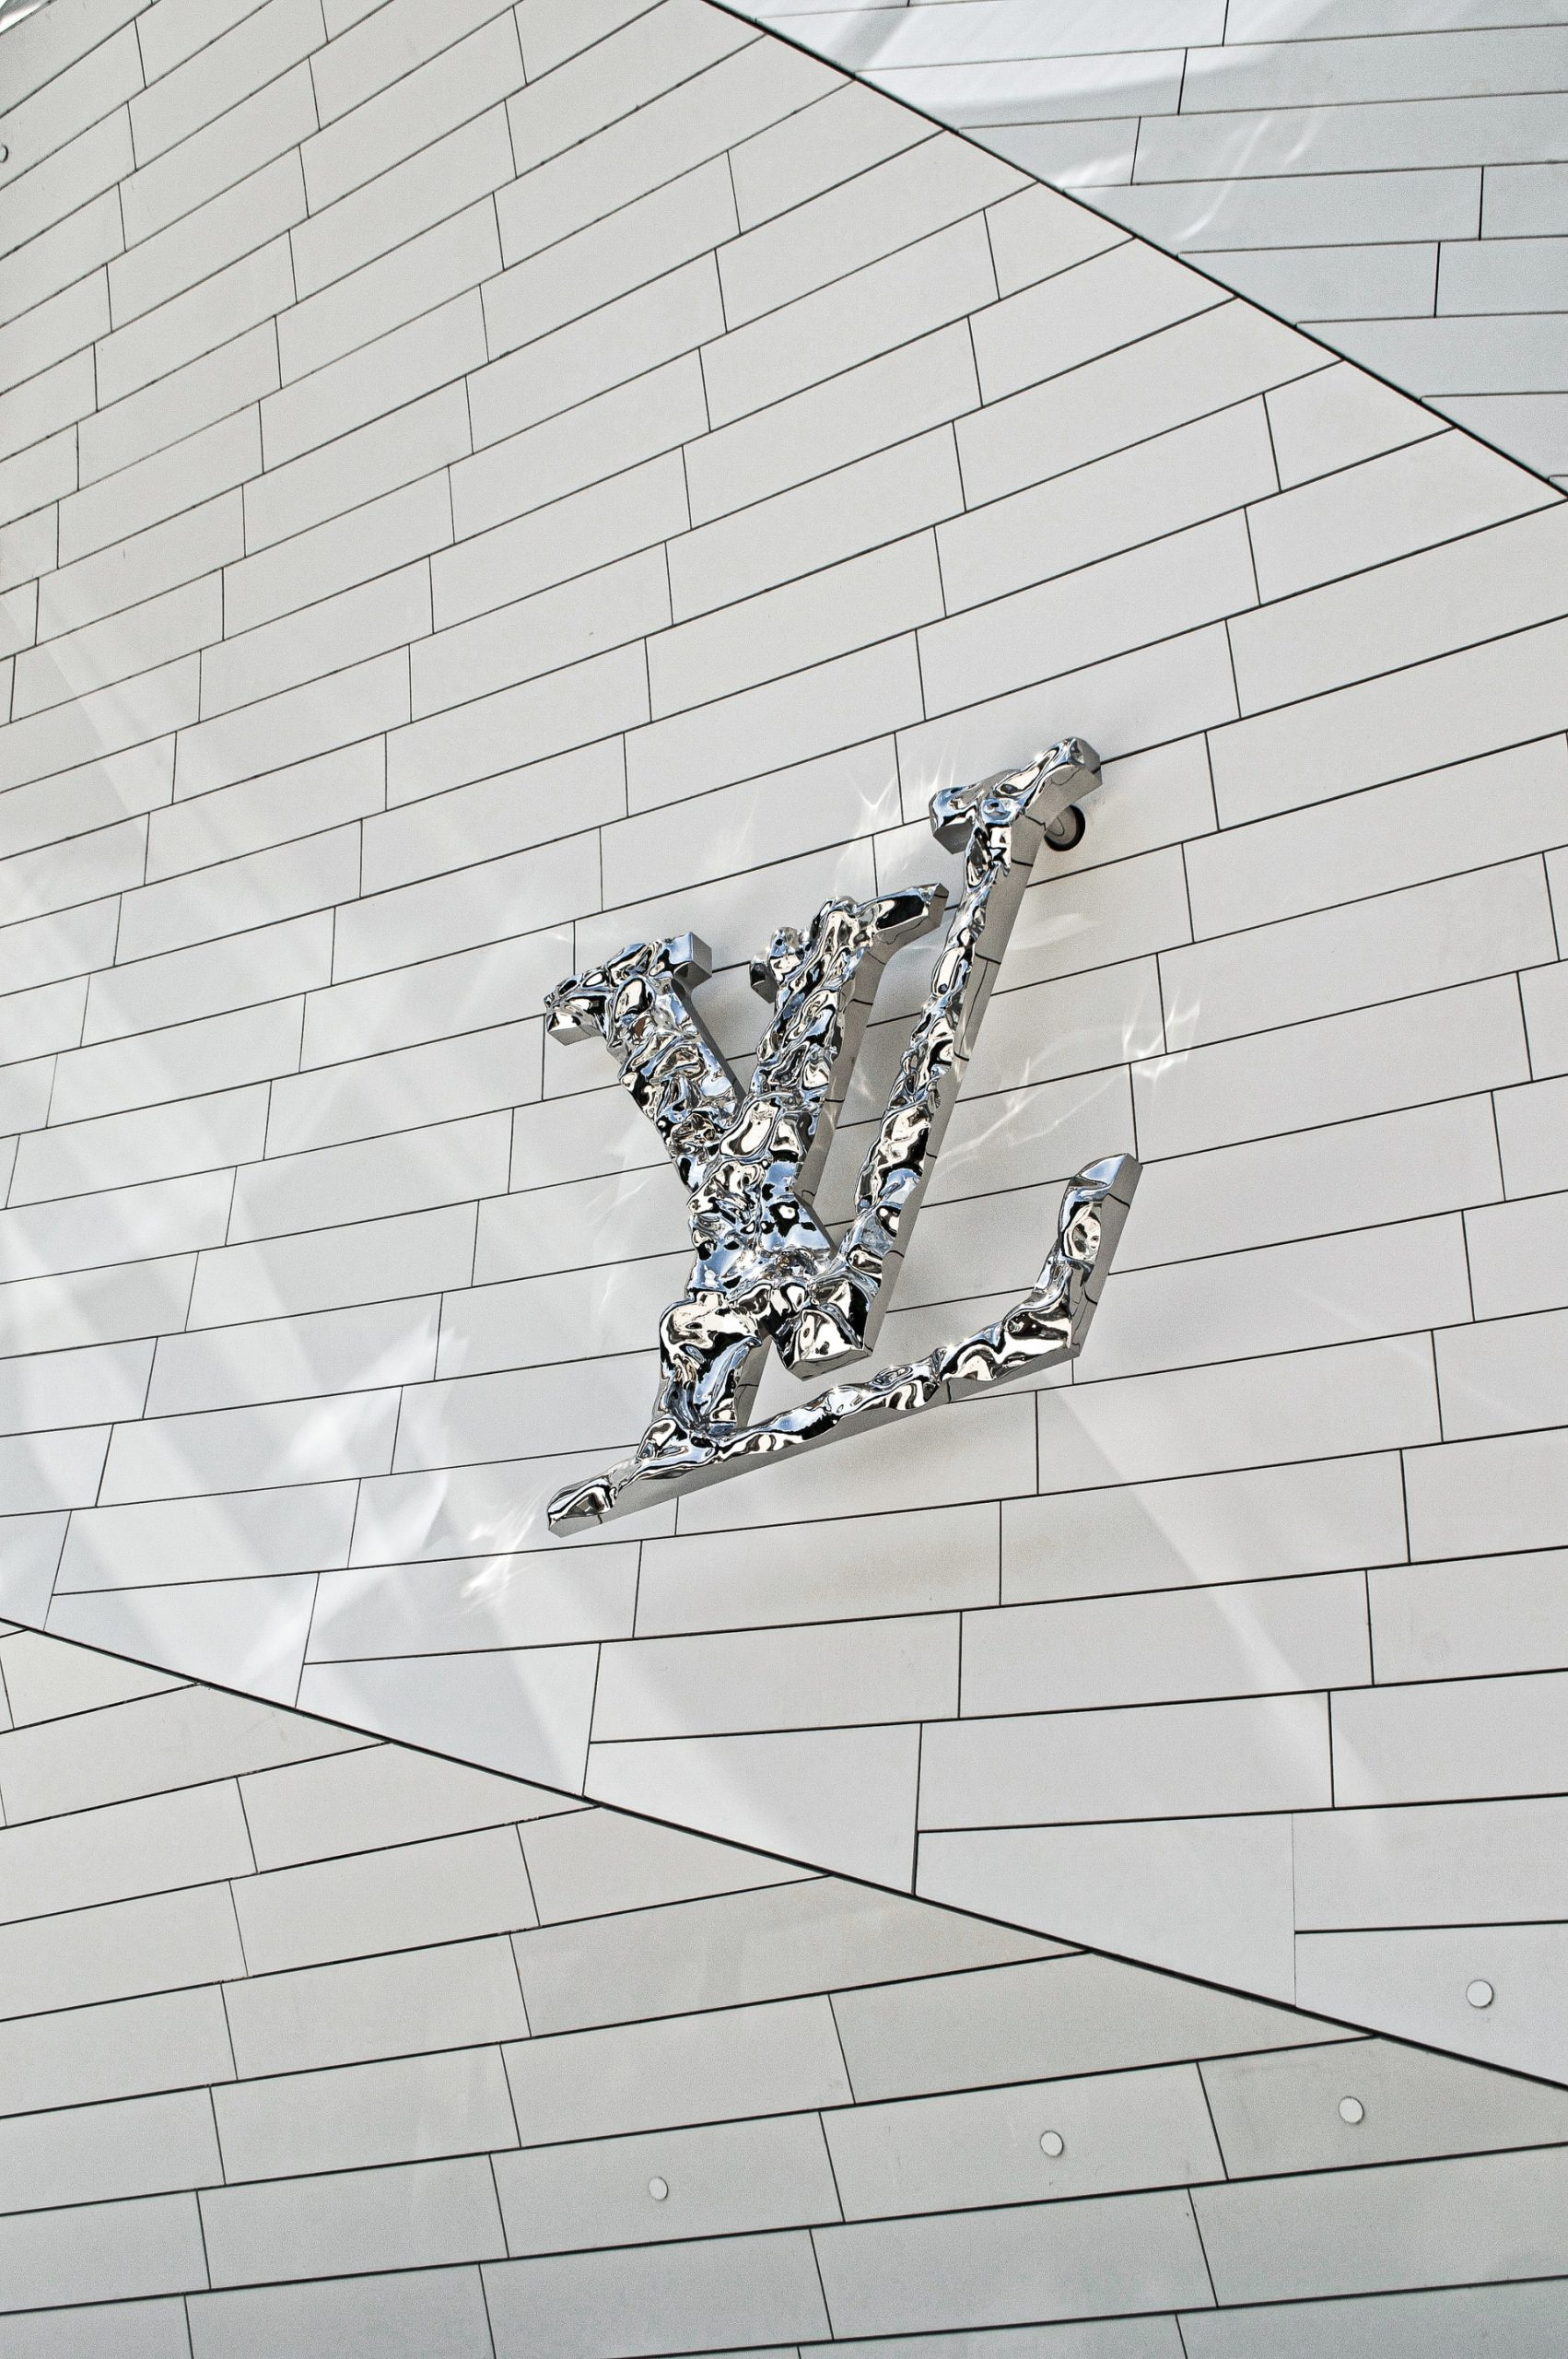 Louis Vuitton Stiftung